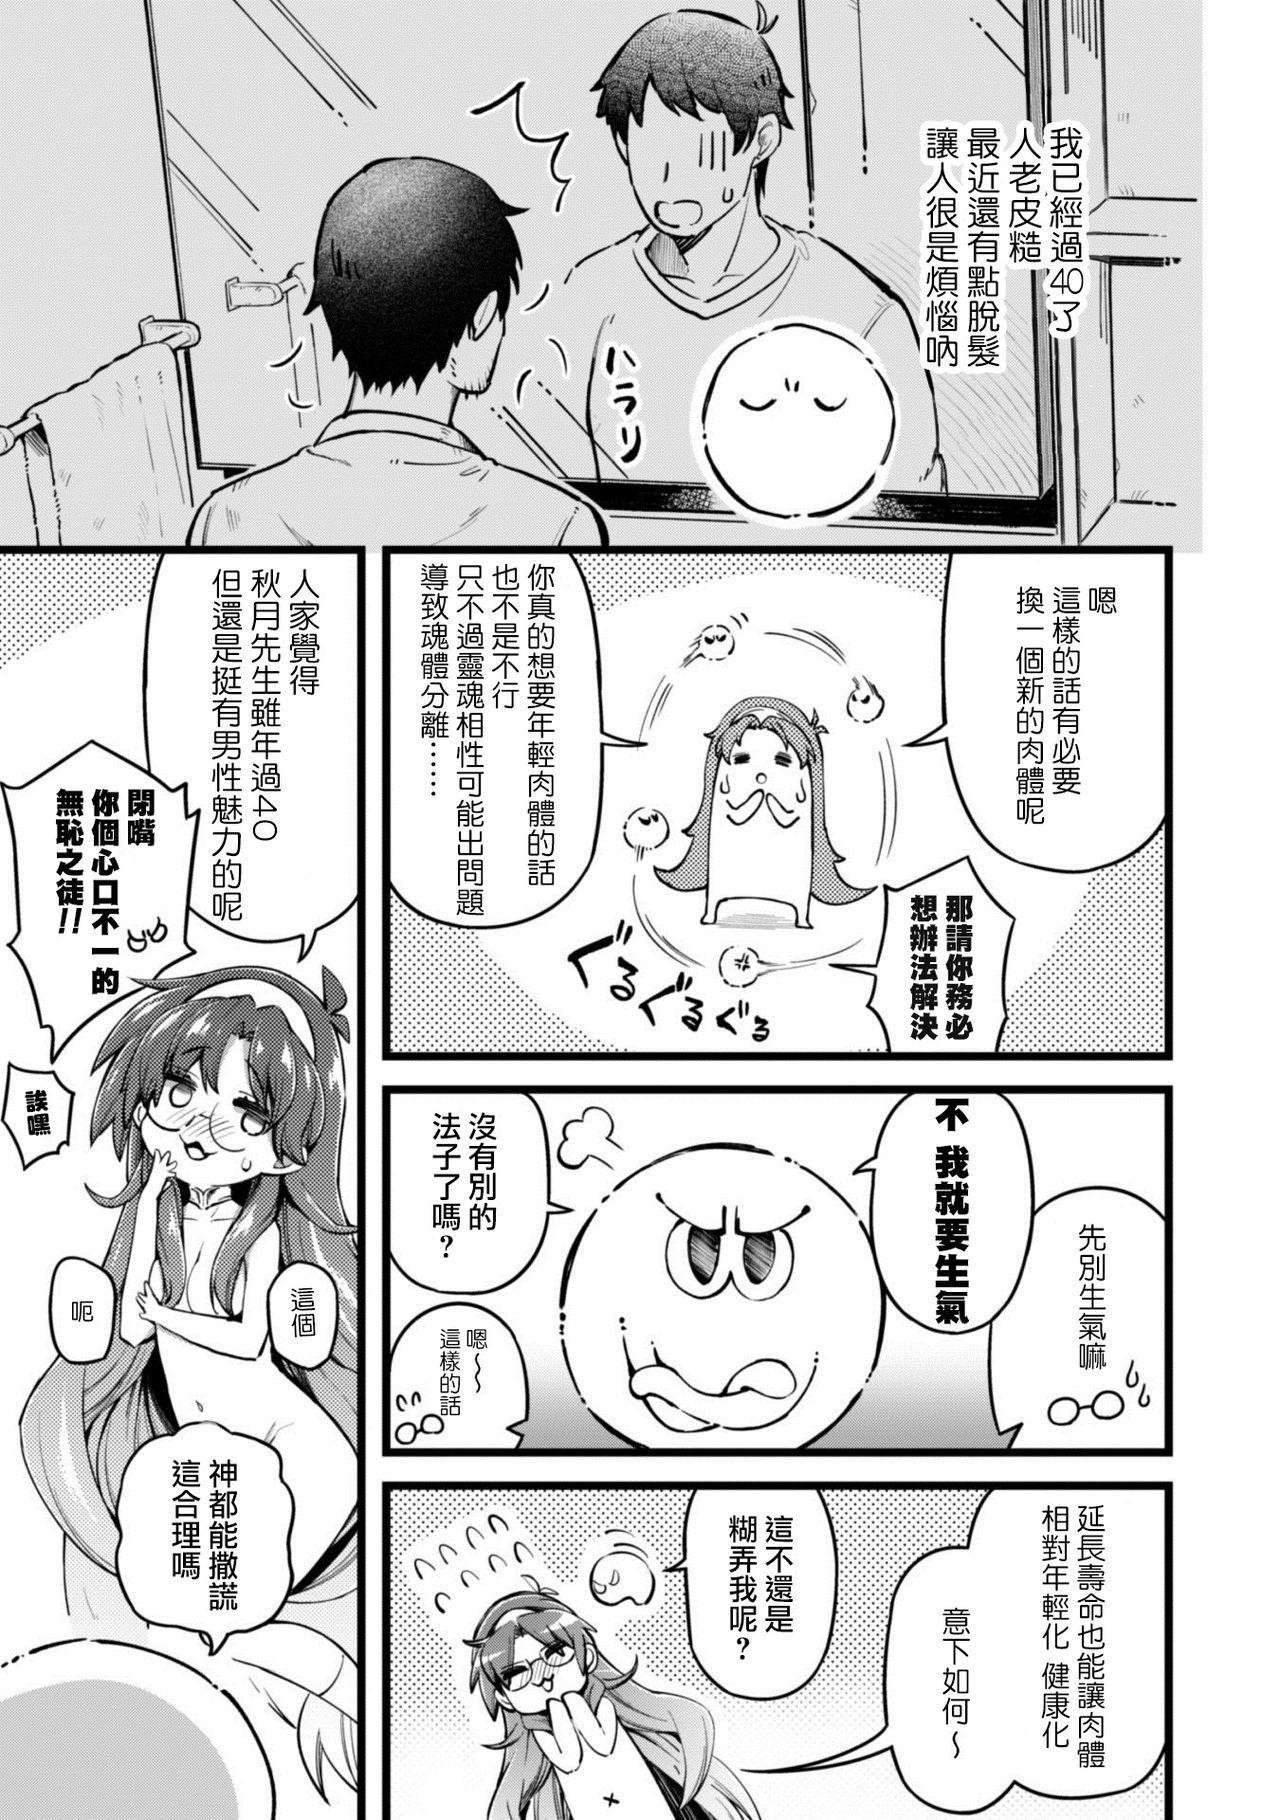 Eroi Skill de Isekai Musou Ch. 1 23